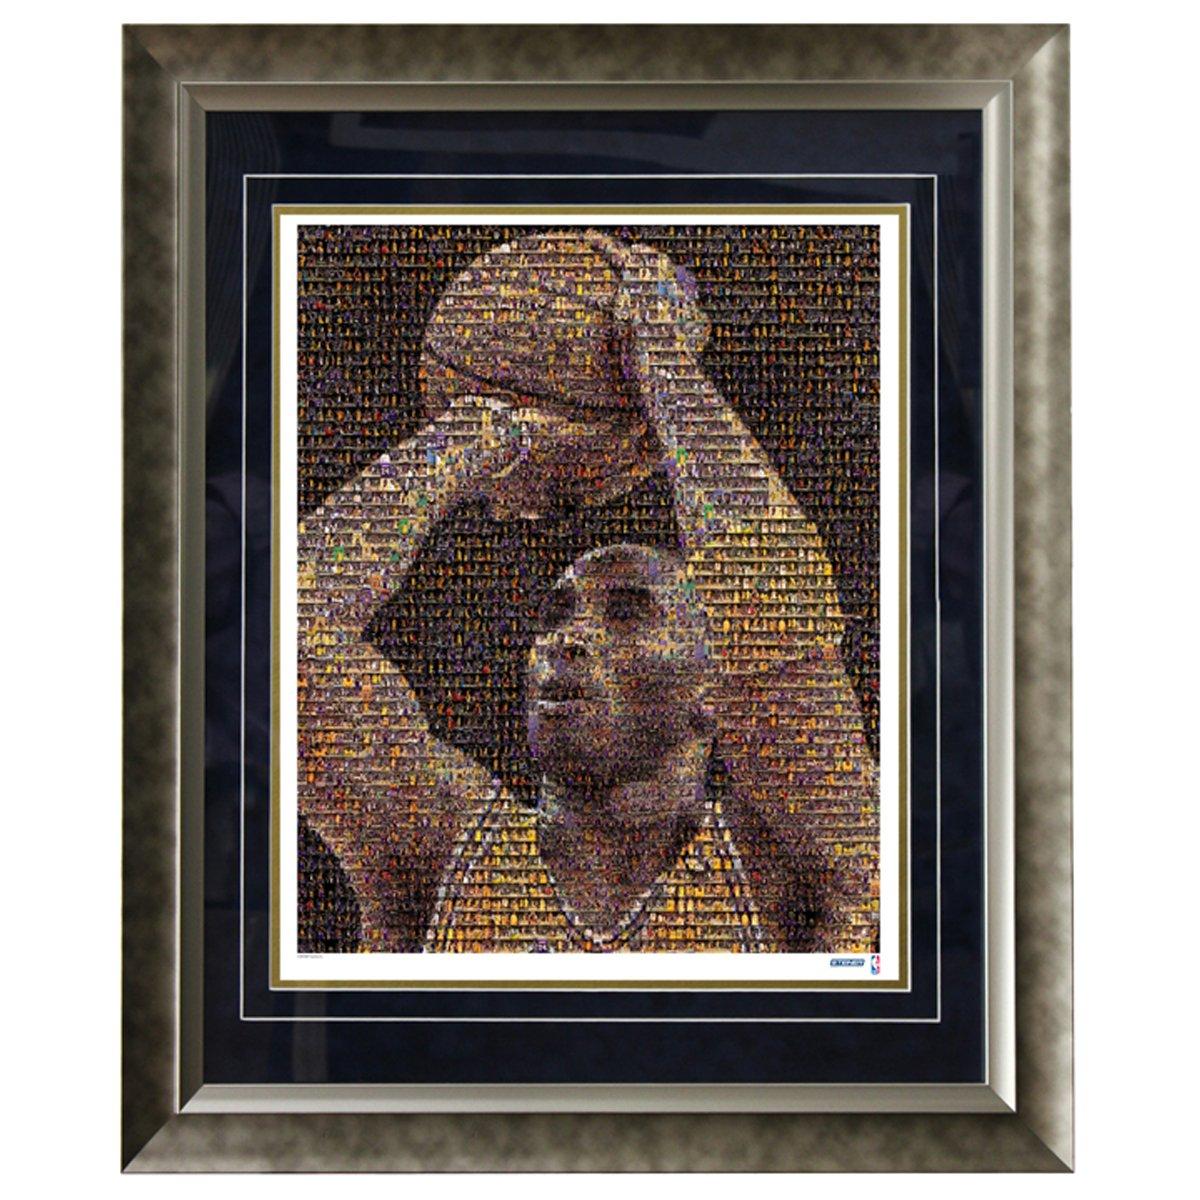 NBA Los Angeles Lakers Kobe Bryant 16x20 Mosaic Framed Photo